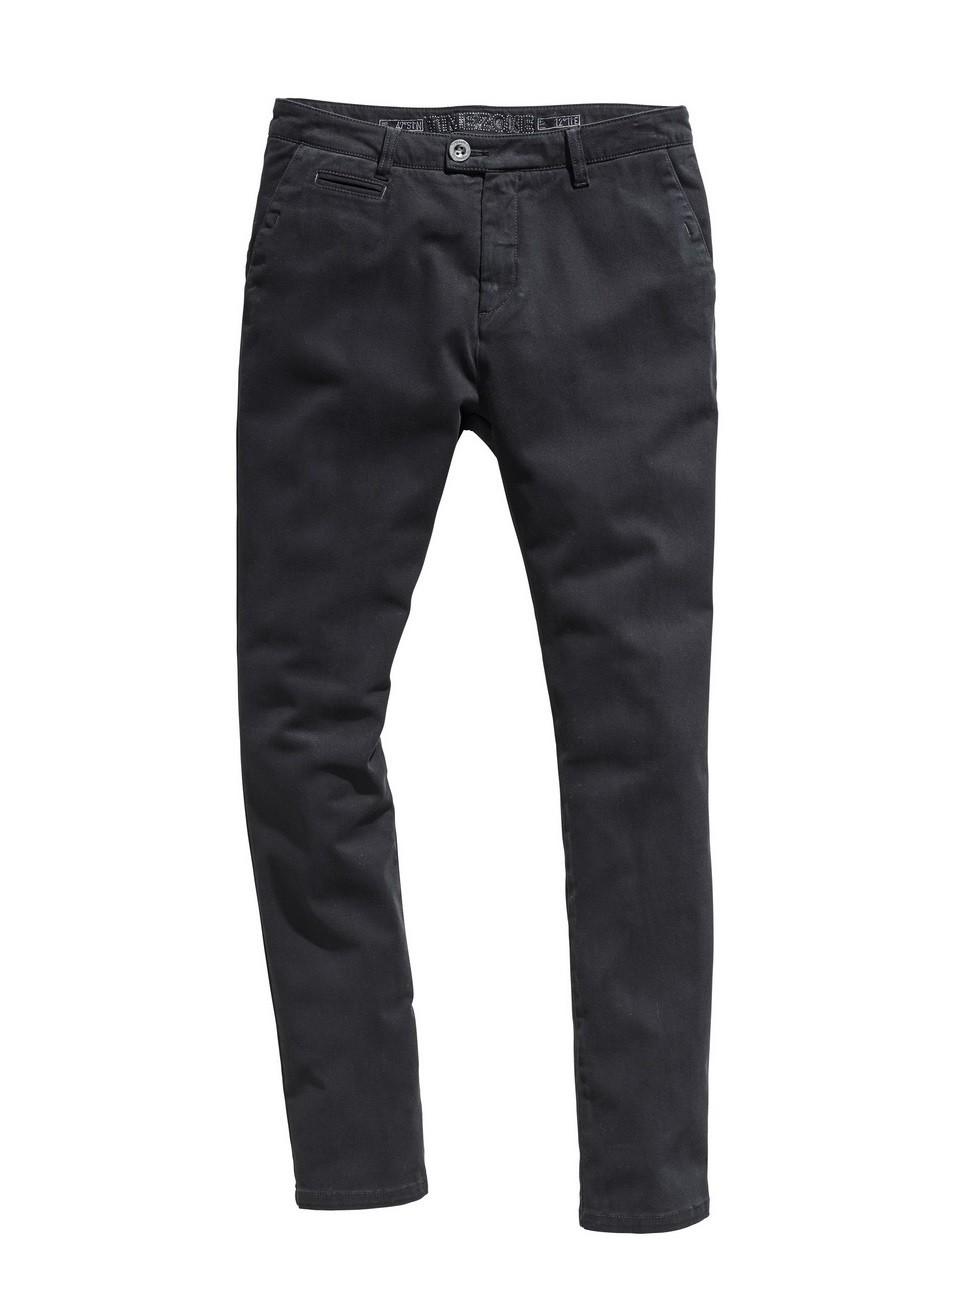 timezone damen hose lucytz regular fit schwarz black kaufen jeans direct de. Black Bedroom Furniture Sets. Home Design Ideas